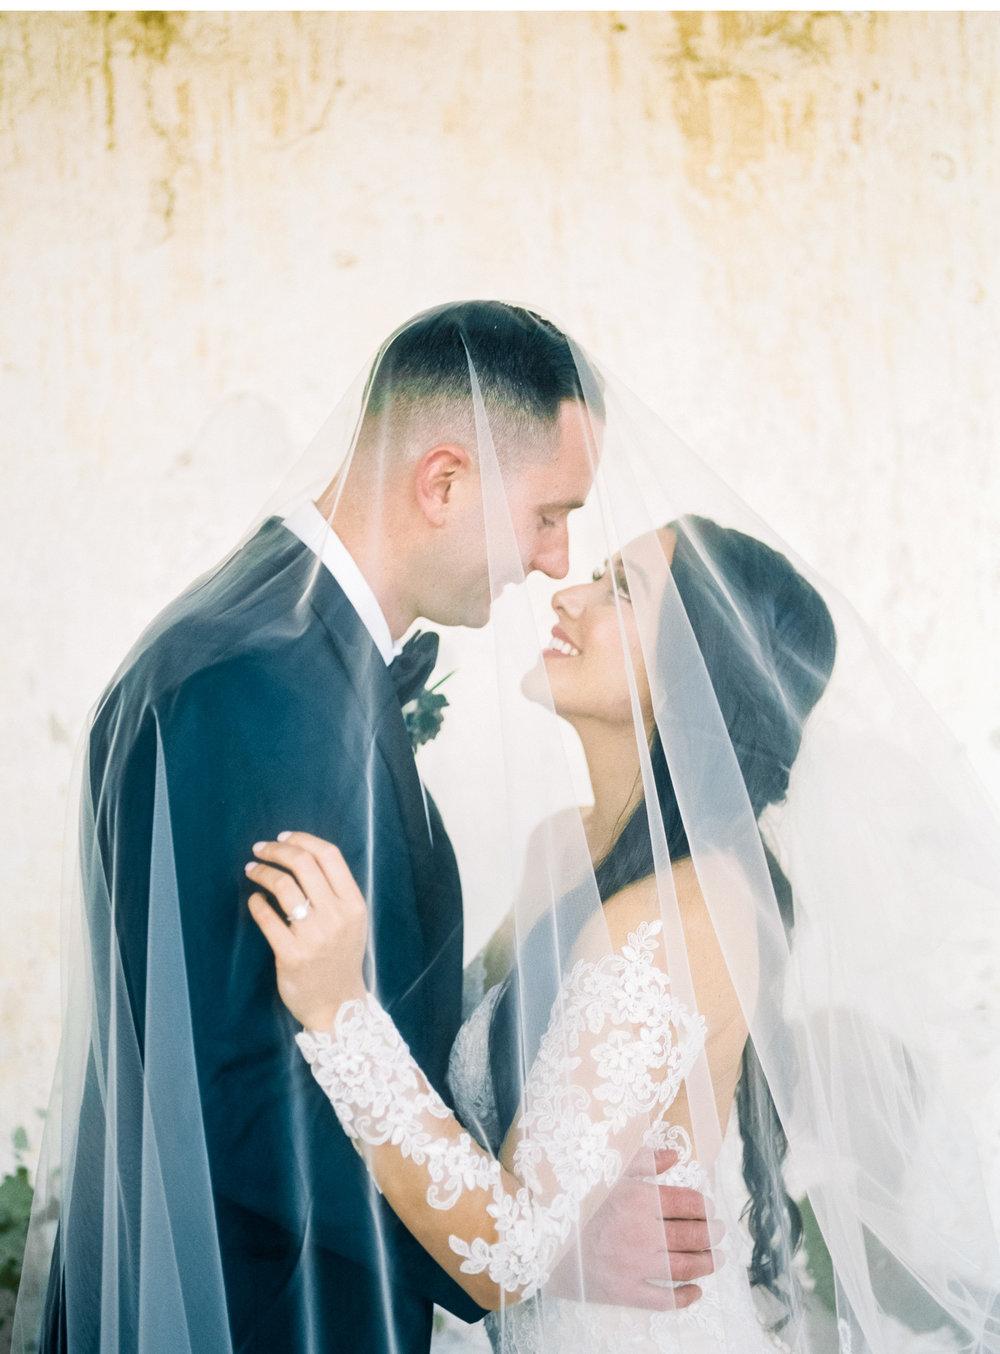 Malibu-Weddings-Natalie-Schutt-Photography_04.jpg